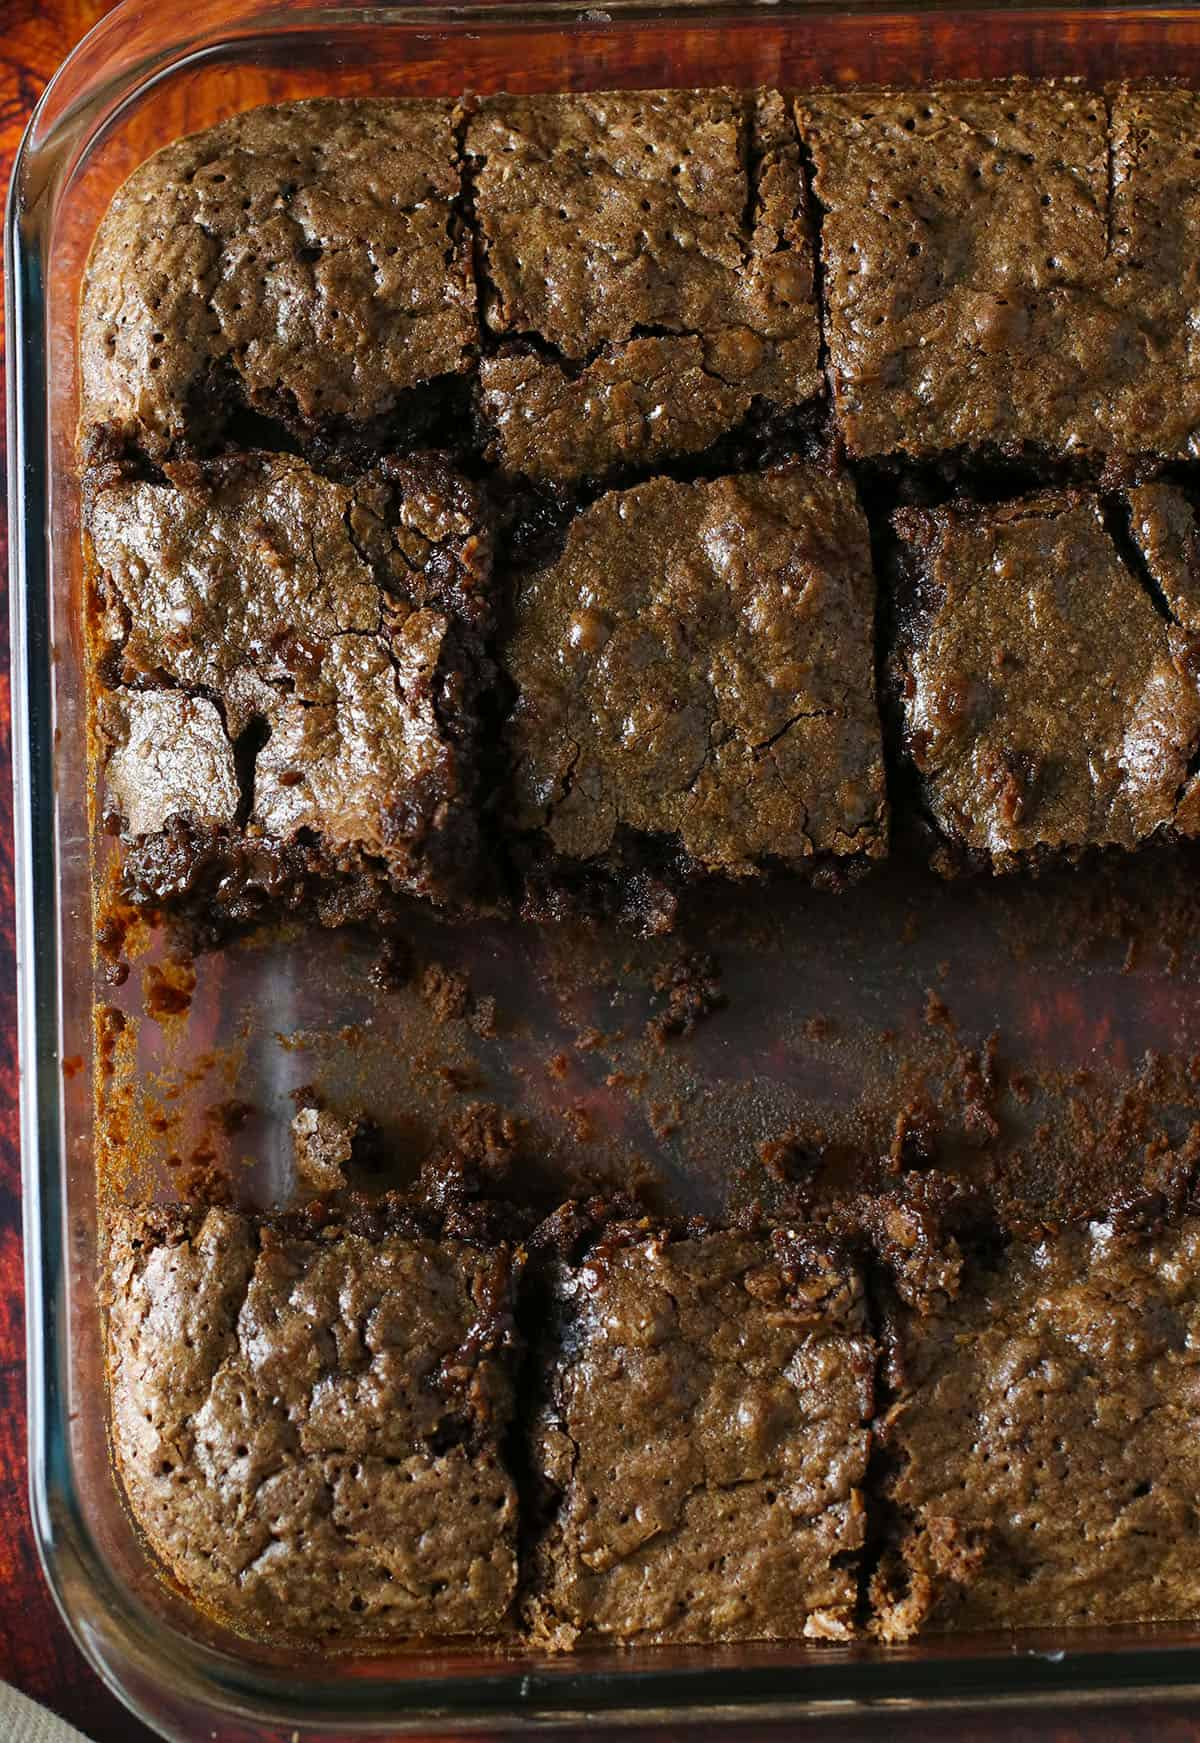 Top shot of chocolate brownies in a pan.